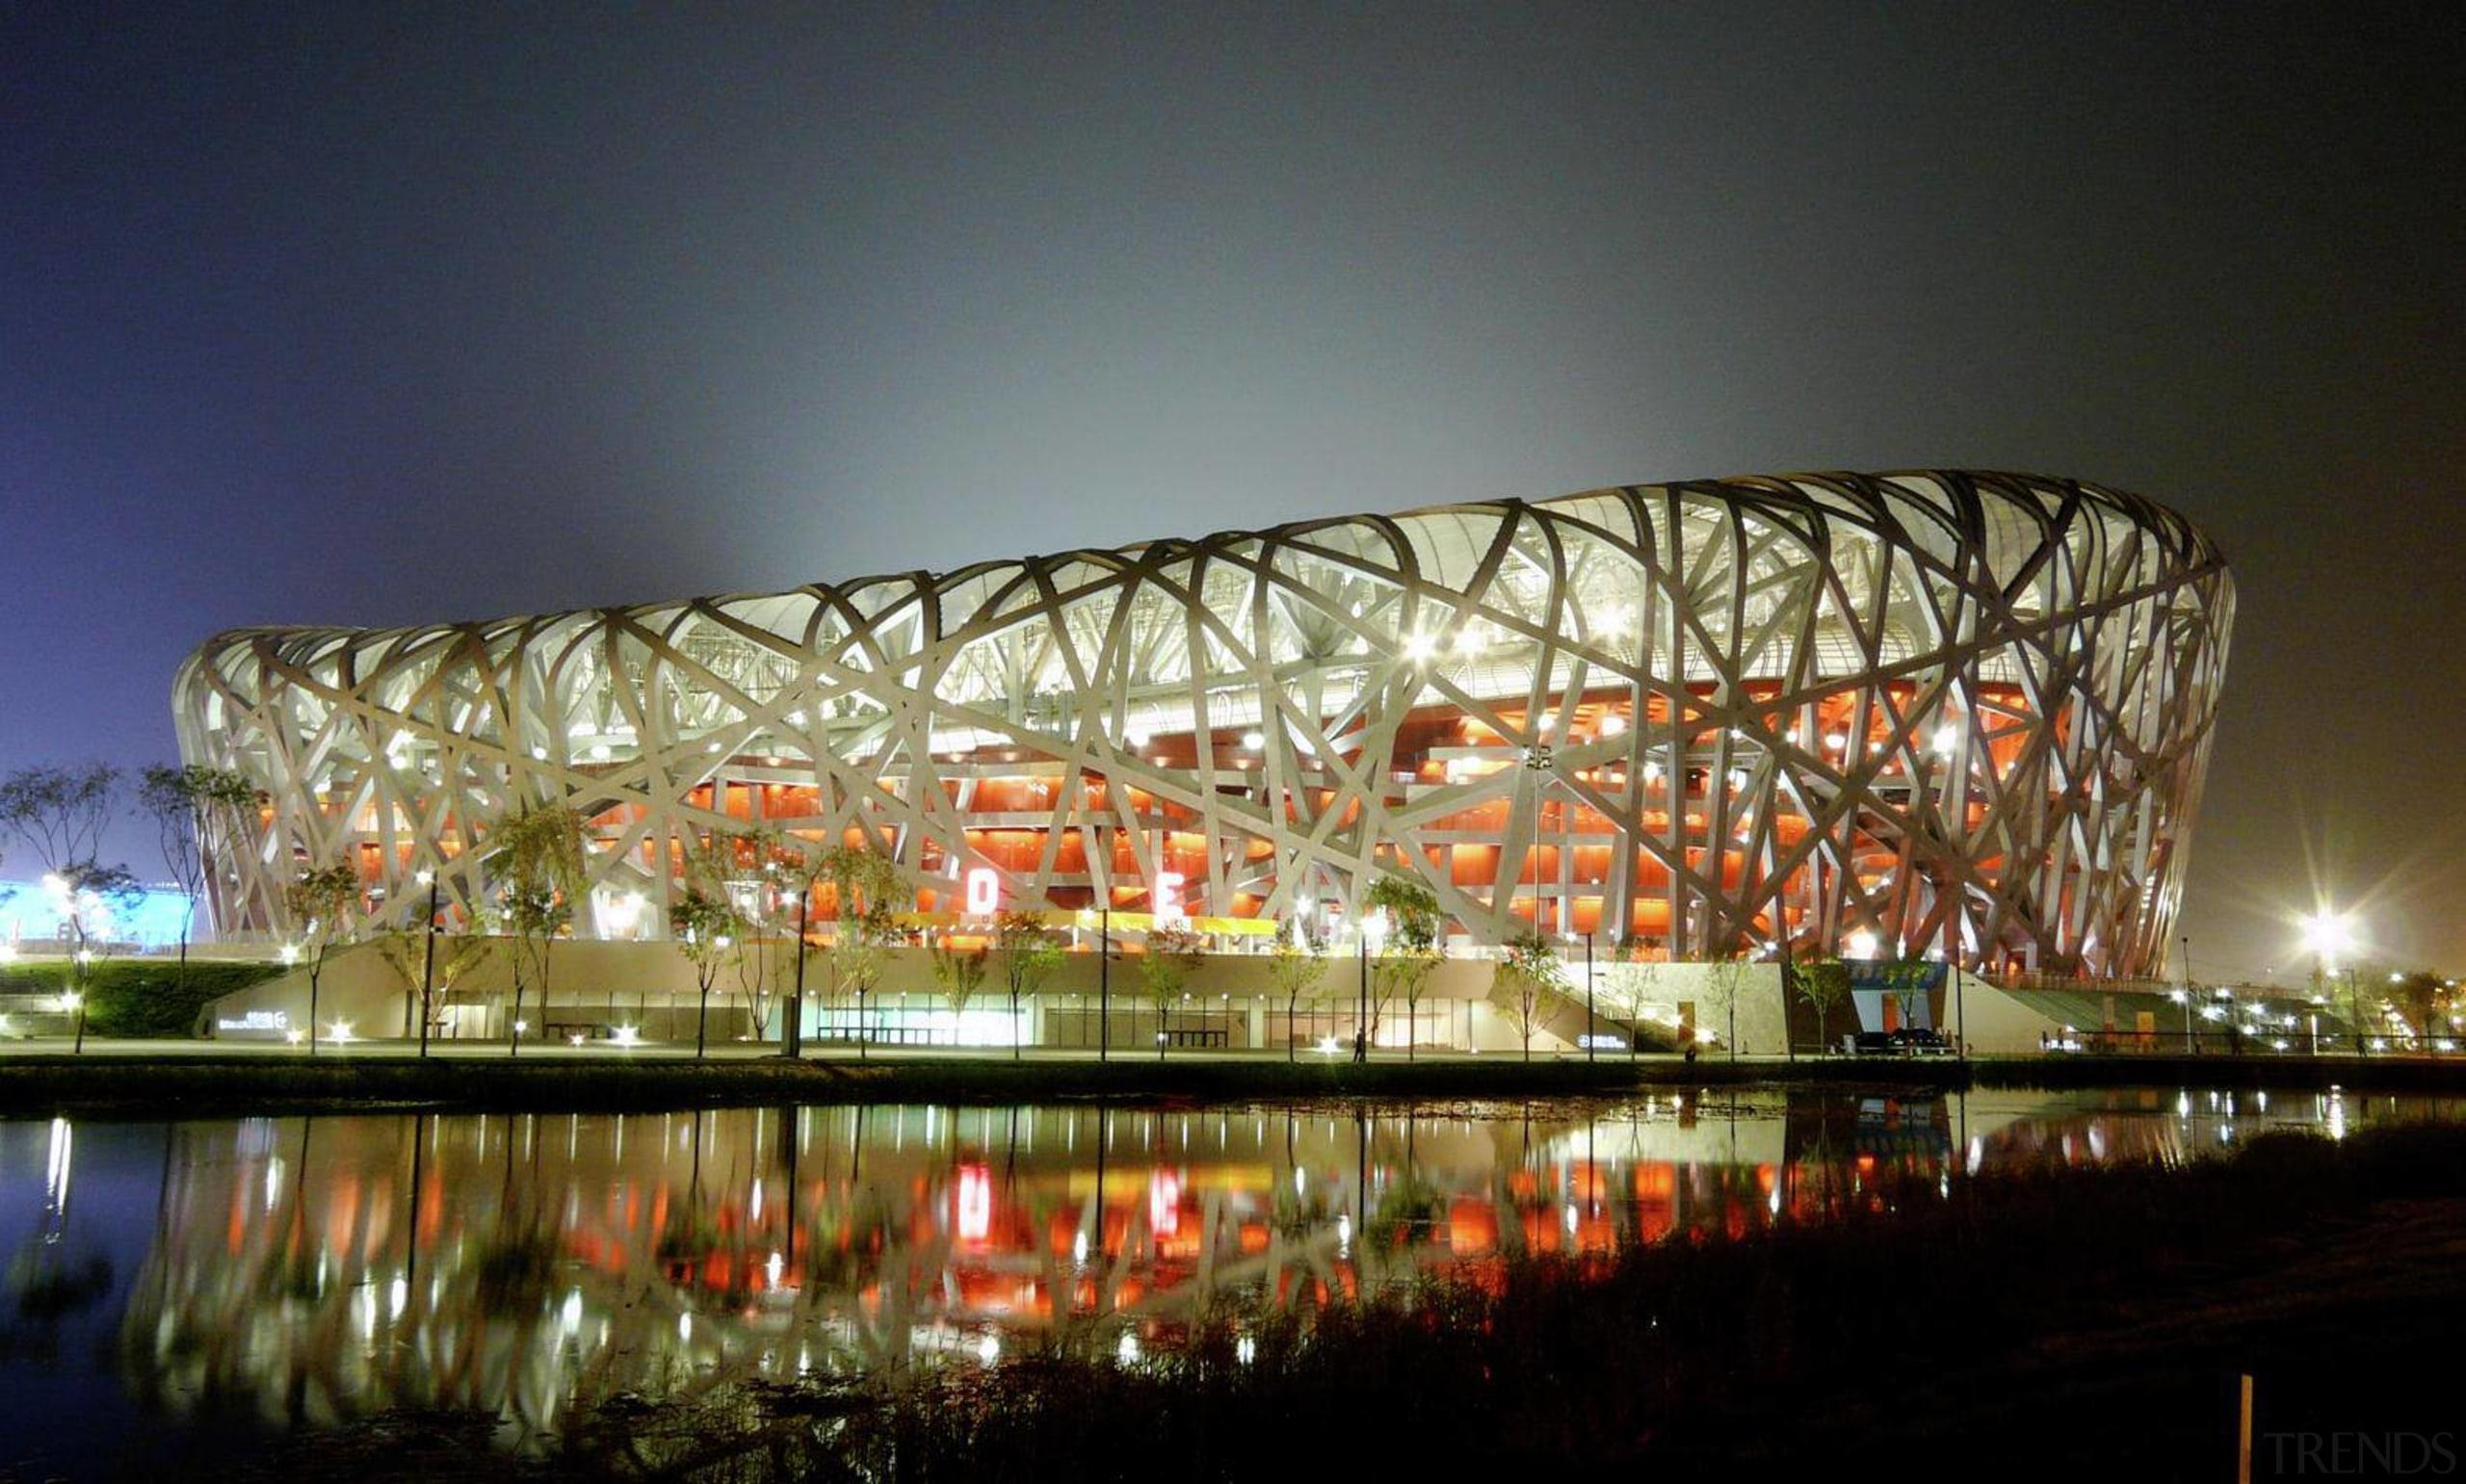 Beijing National Stadium by Herzog de Meuron, ArupSport architecture, convention center, lighting, mixed use, night, opera house, reflection, sport venue, stadium, structure, brown, black